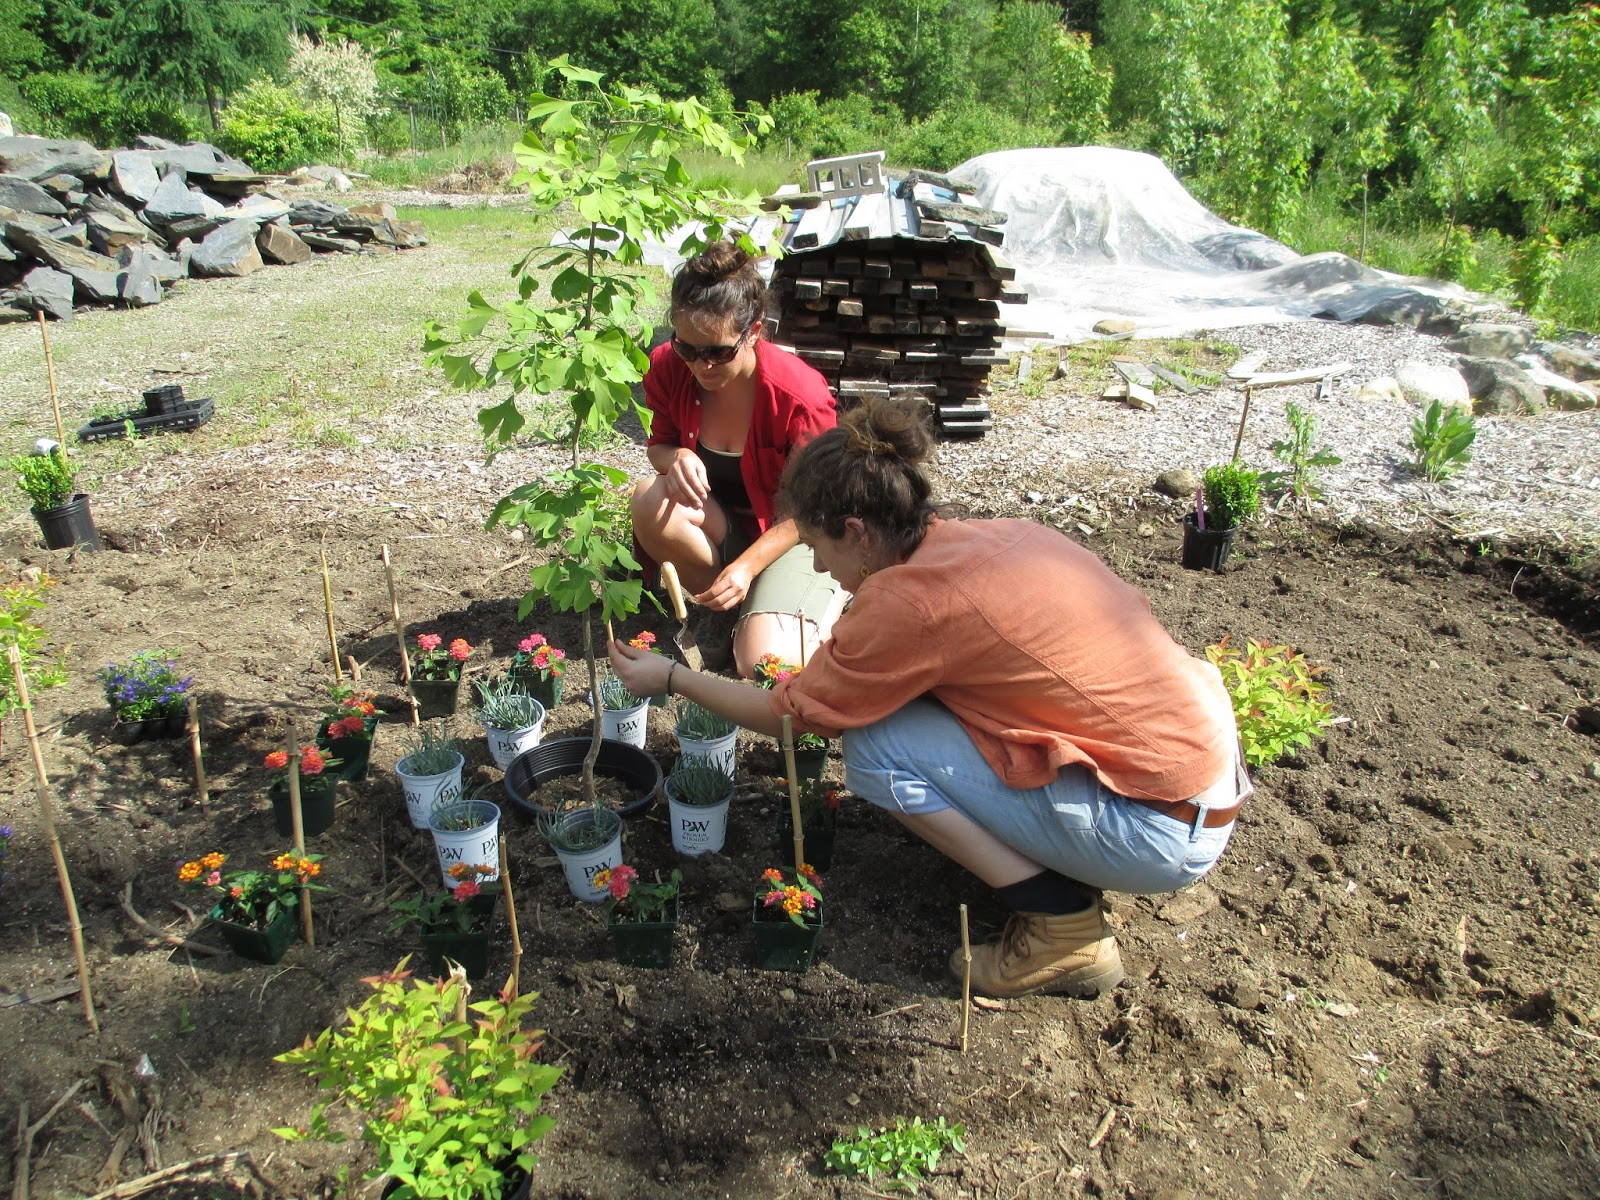 Landscape Gardening Apprenticeships : The view from wilder hill mandala garden project